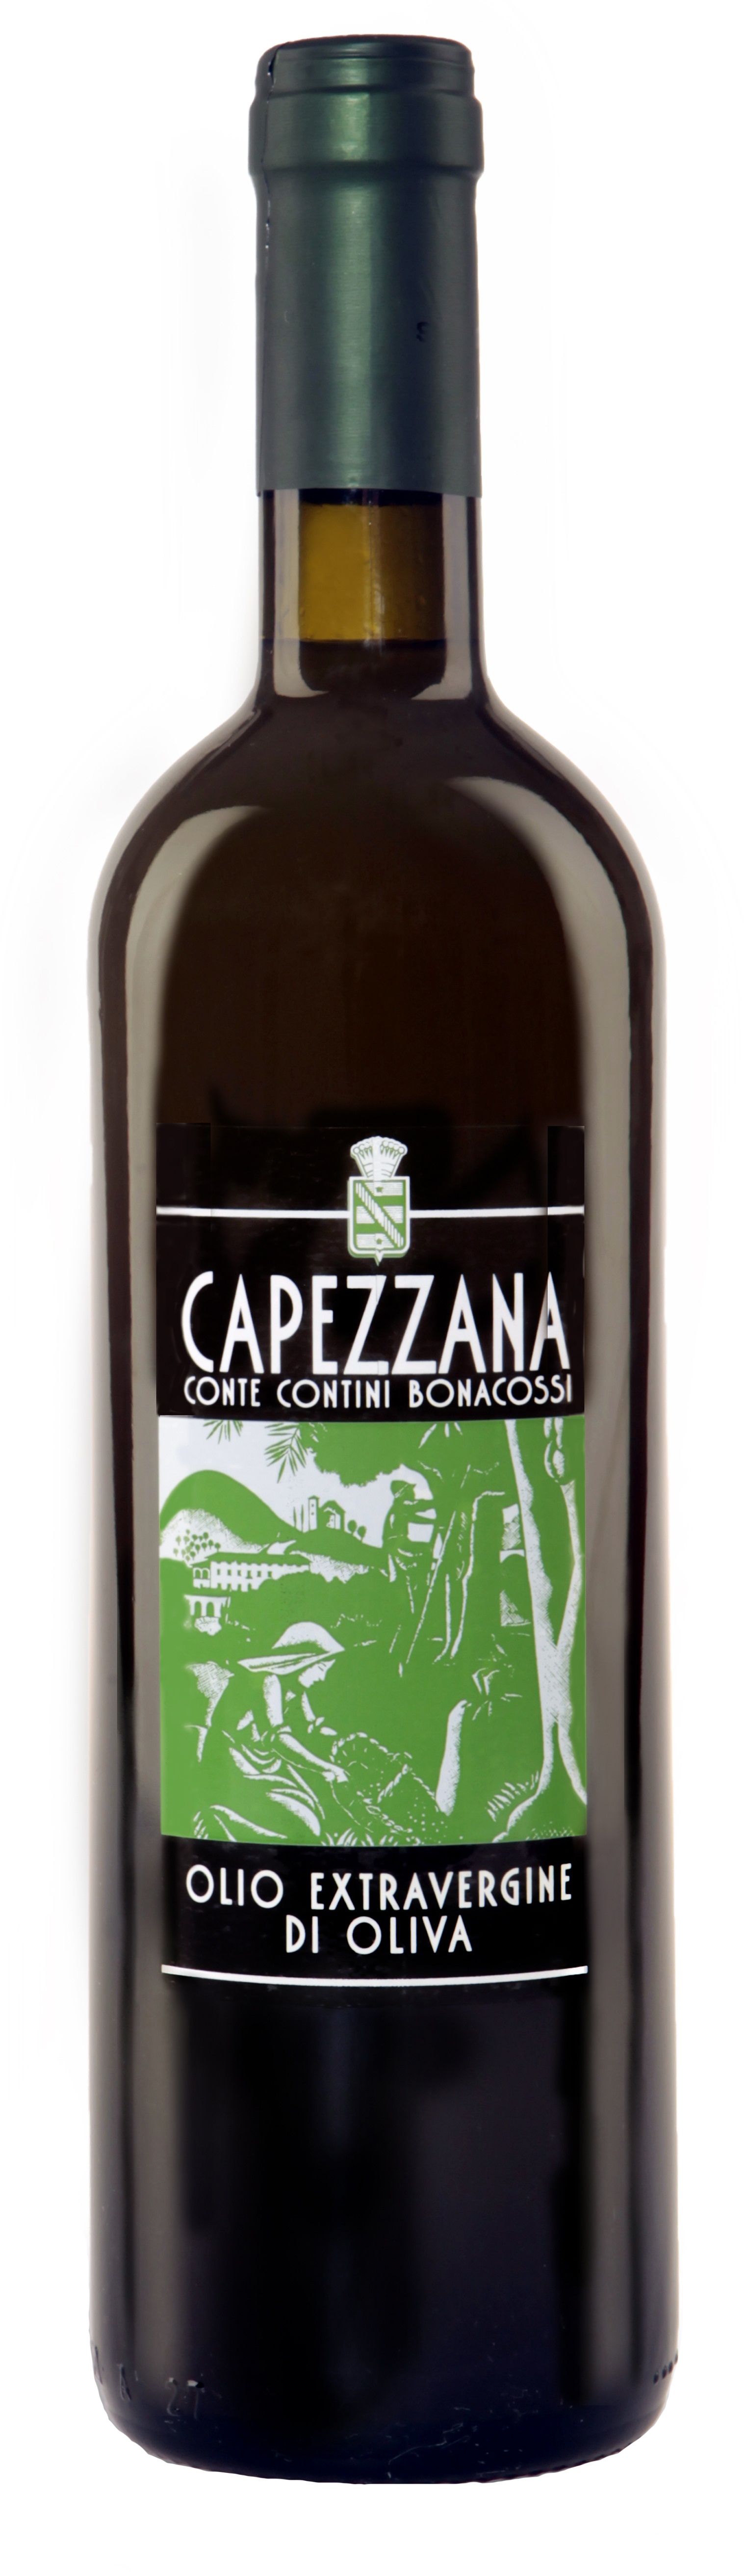 Capezzana, Organic Extra Virgin Olive Oil 2016